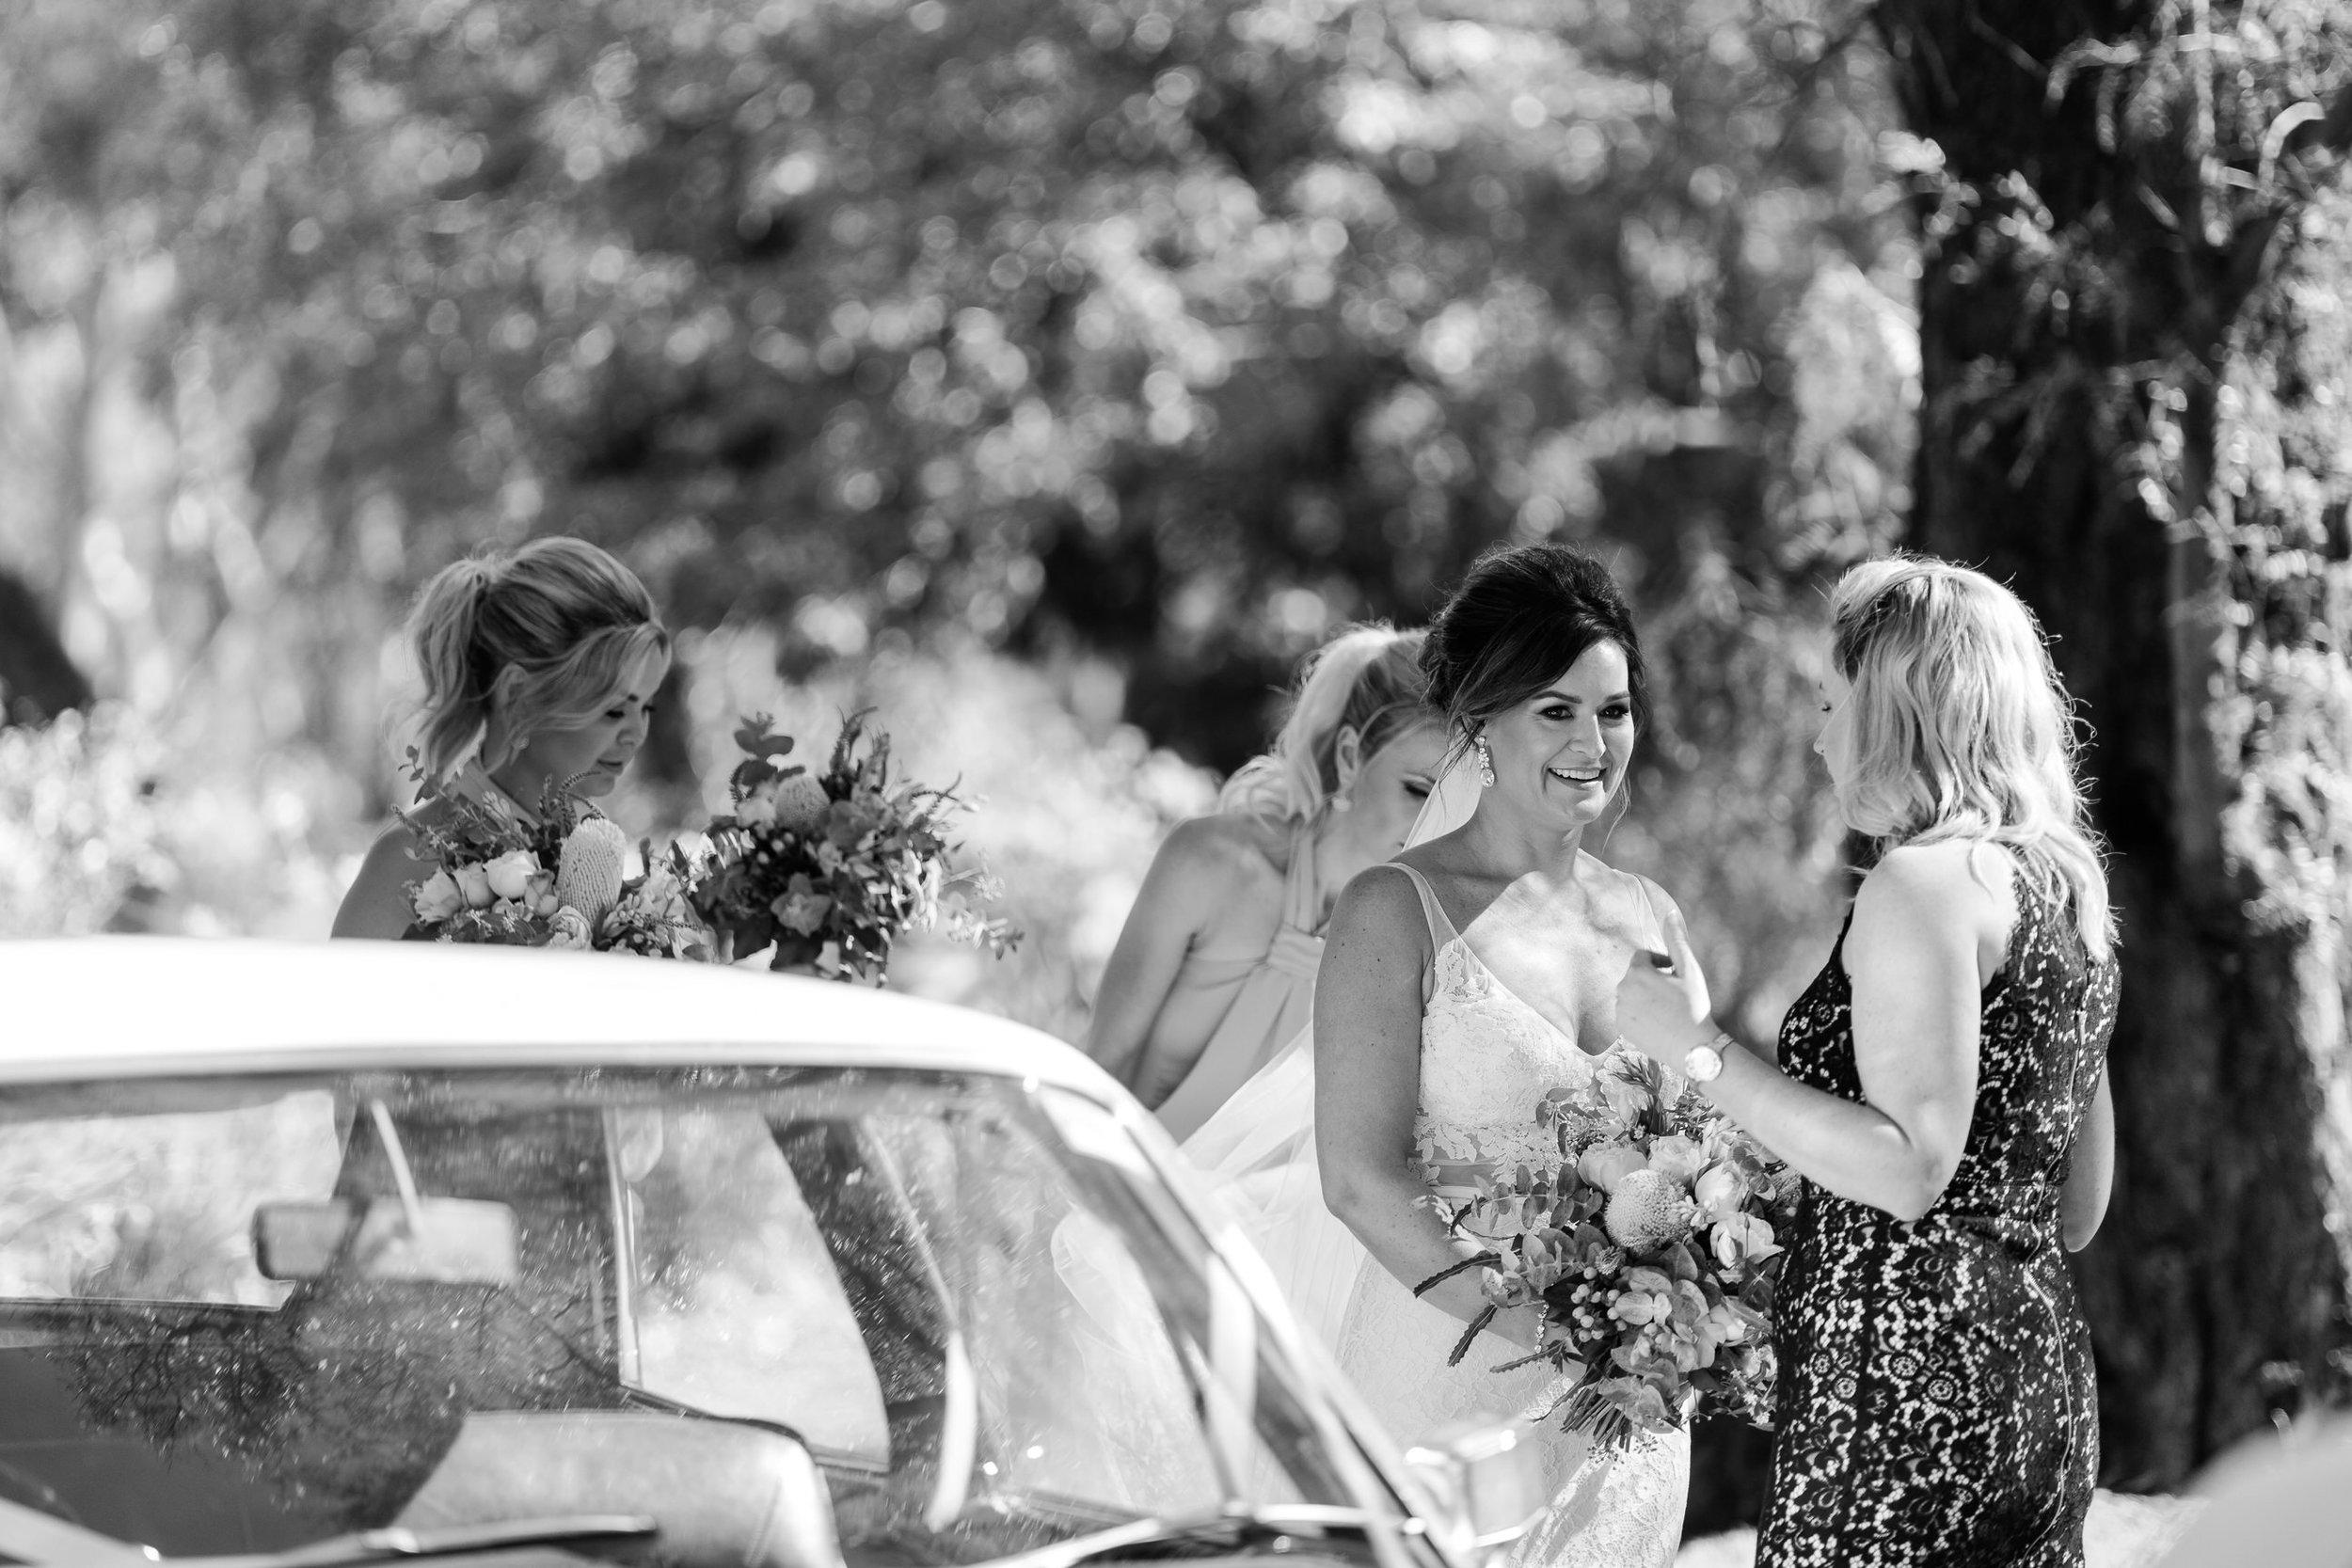 Justin_And_Jim_Photography_Chateau_Dore_Bendigo_Wedding26.JPG